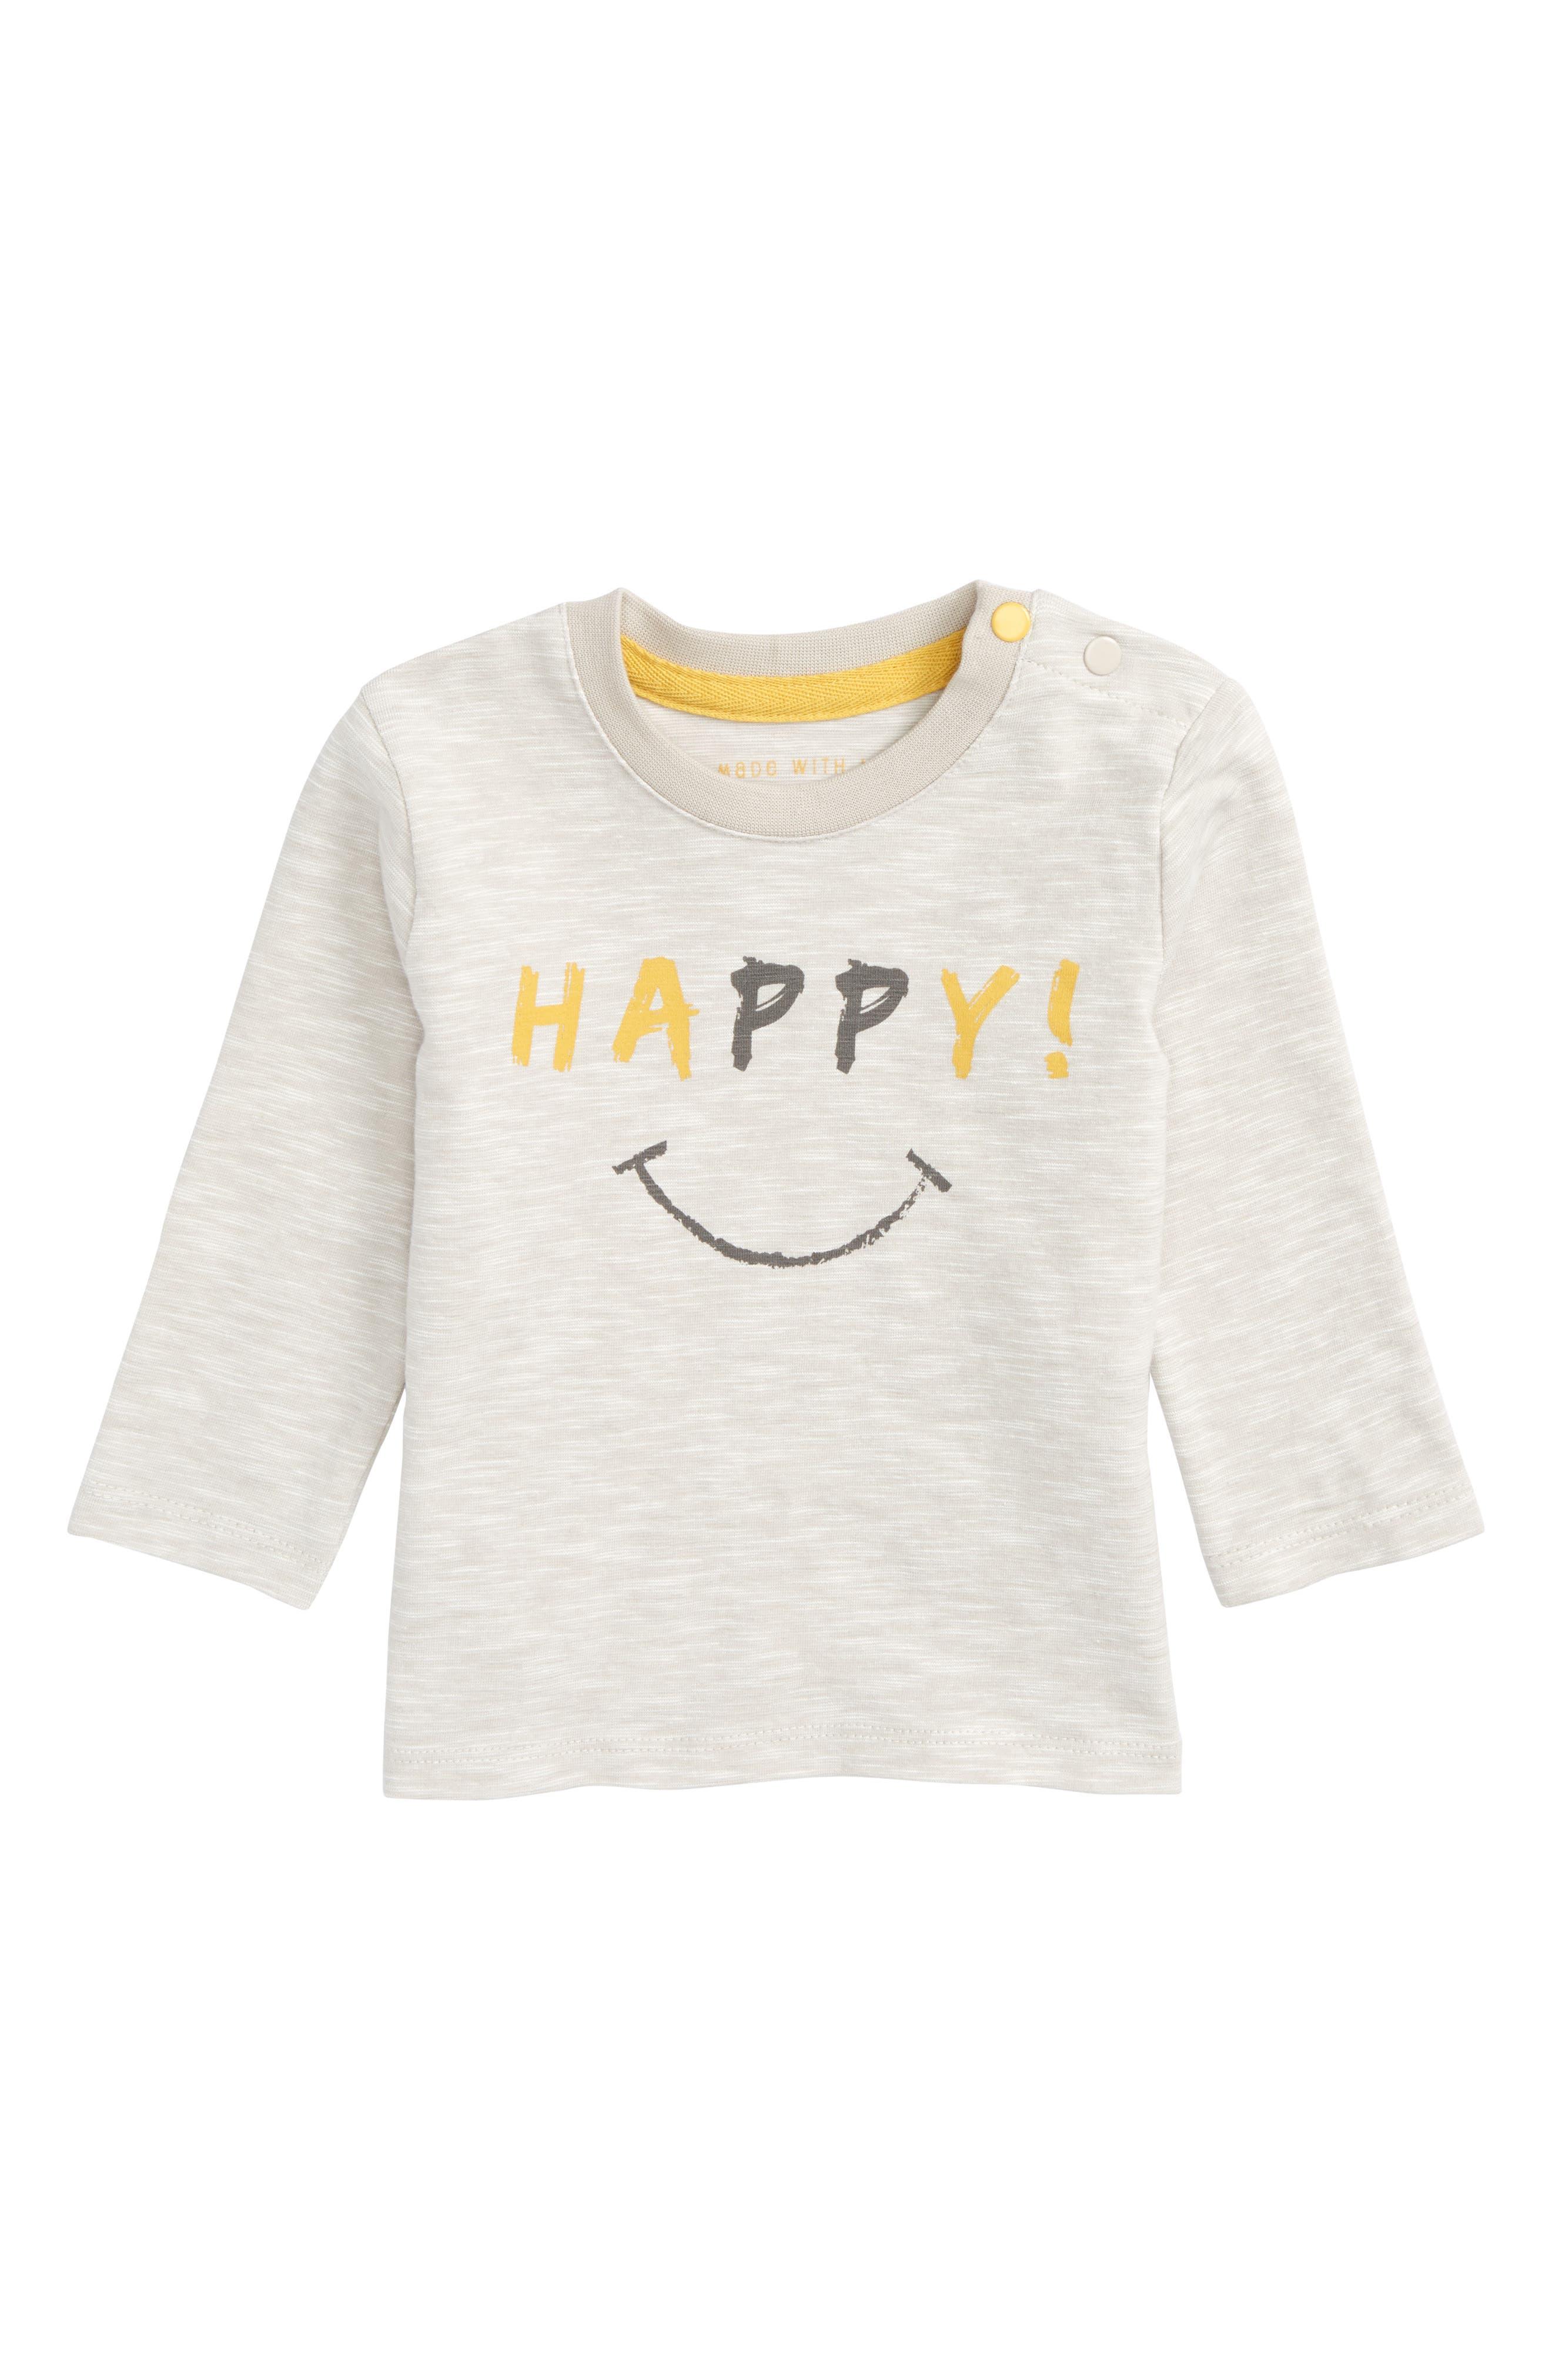 Robeez® Happy Graphic T-Shirt (Baby)